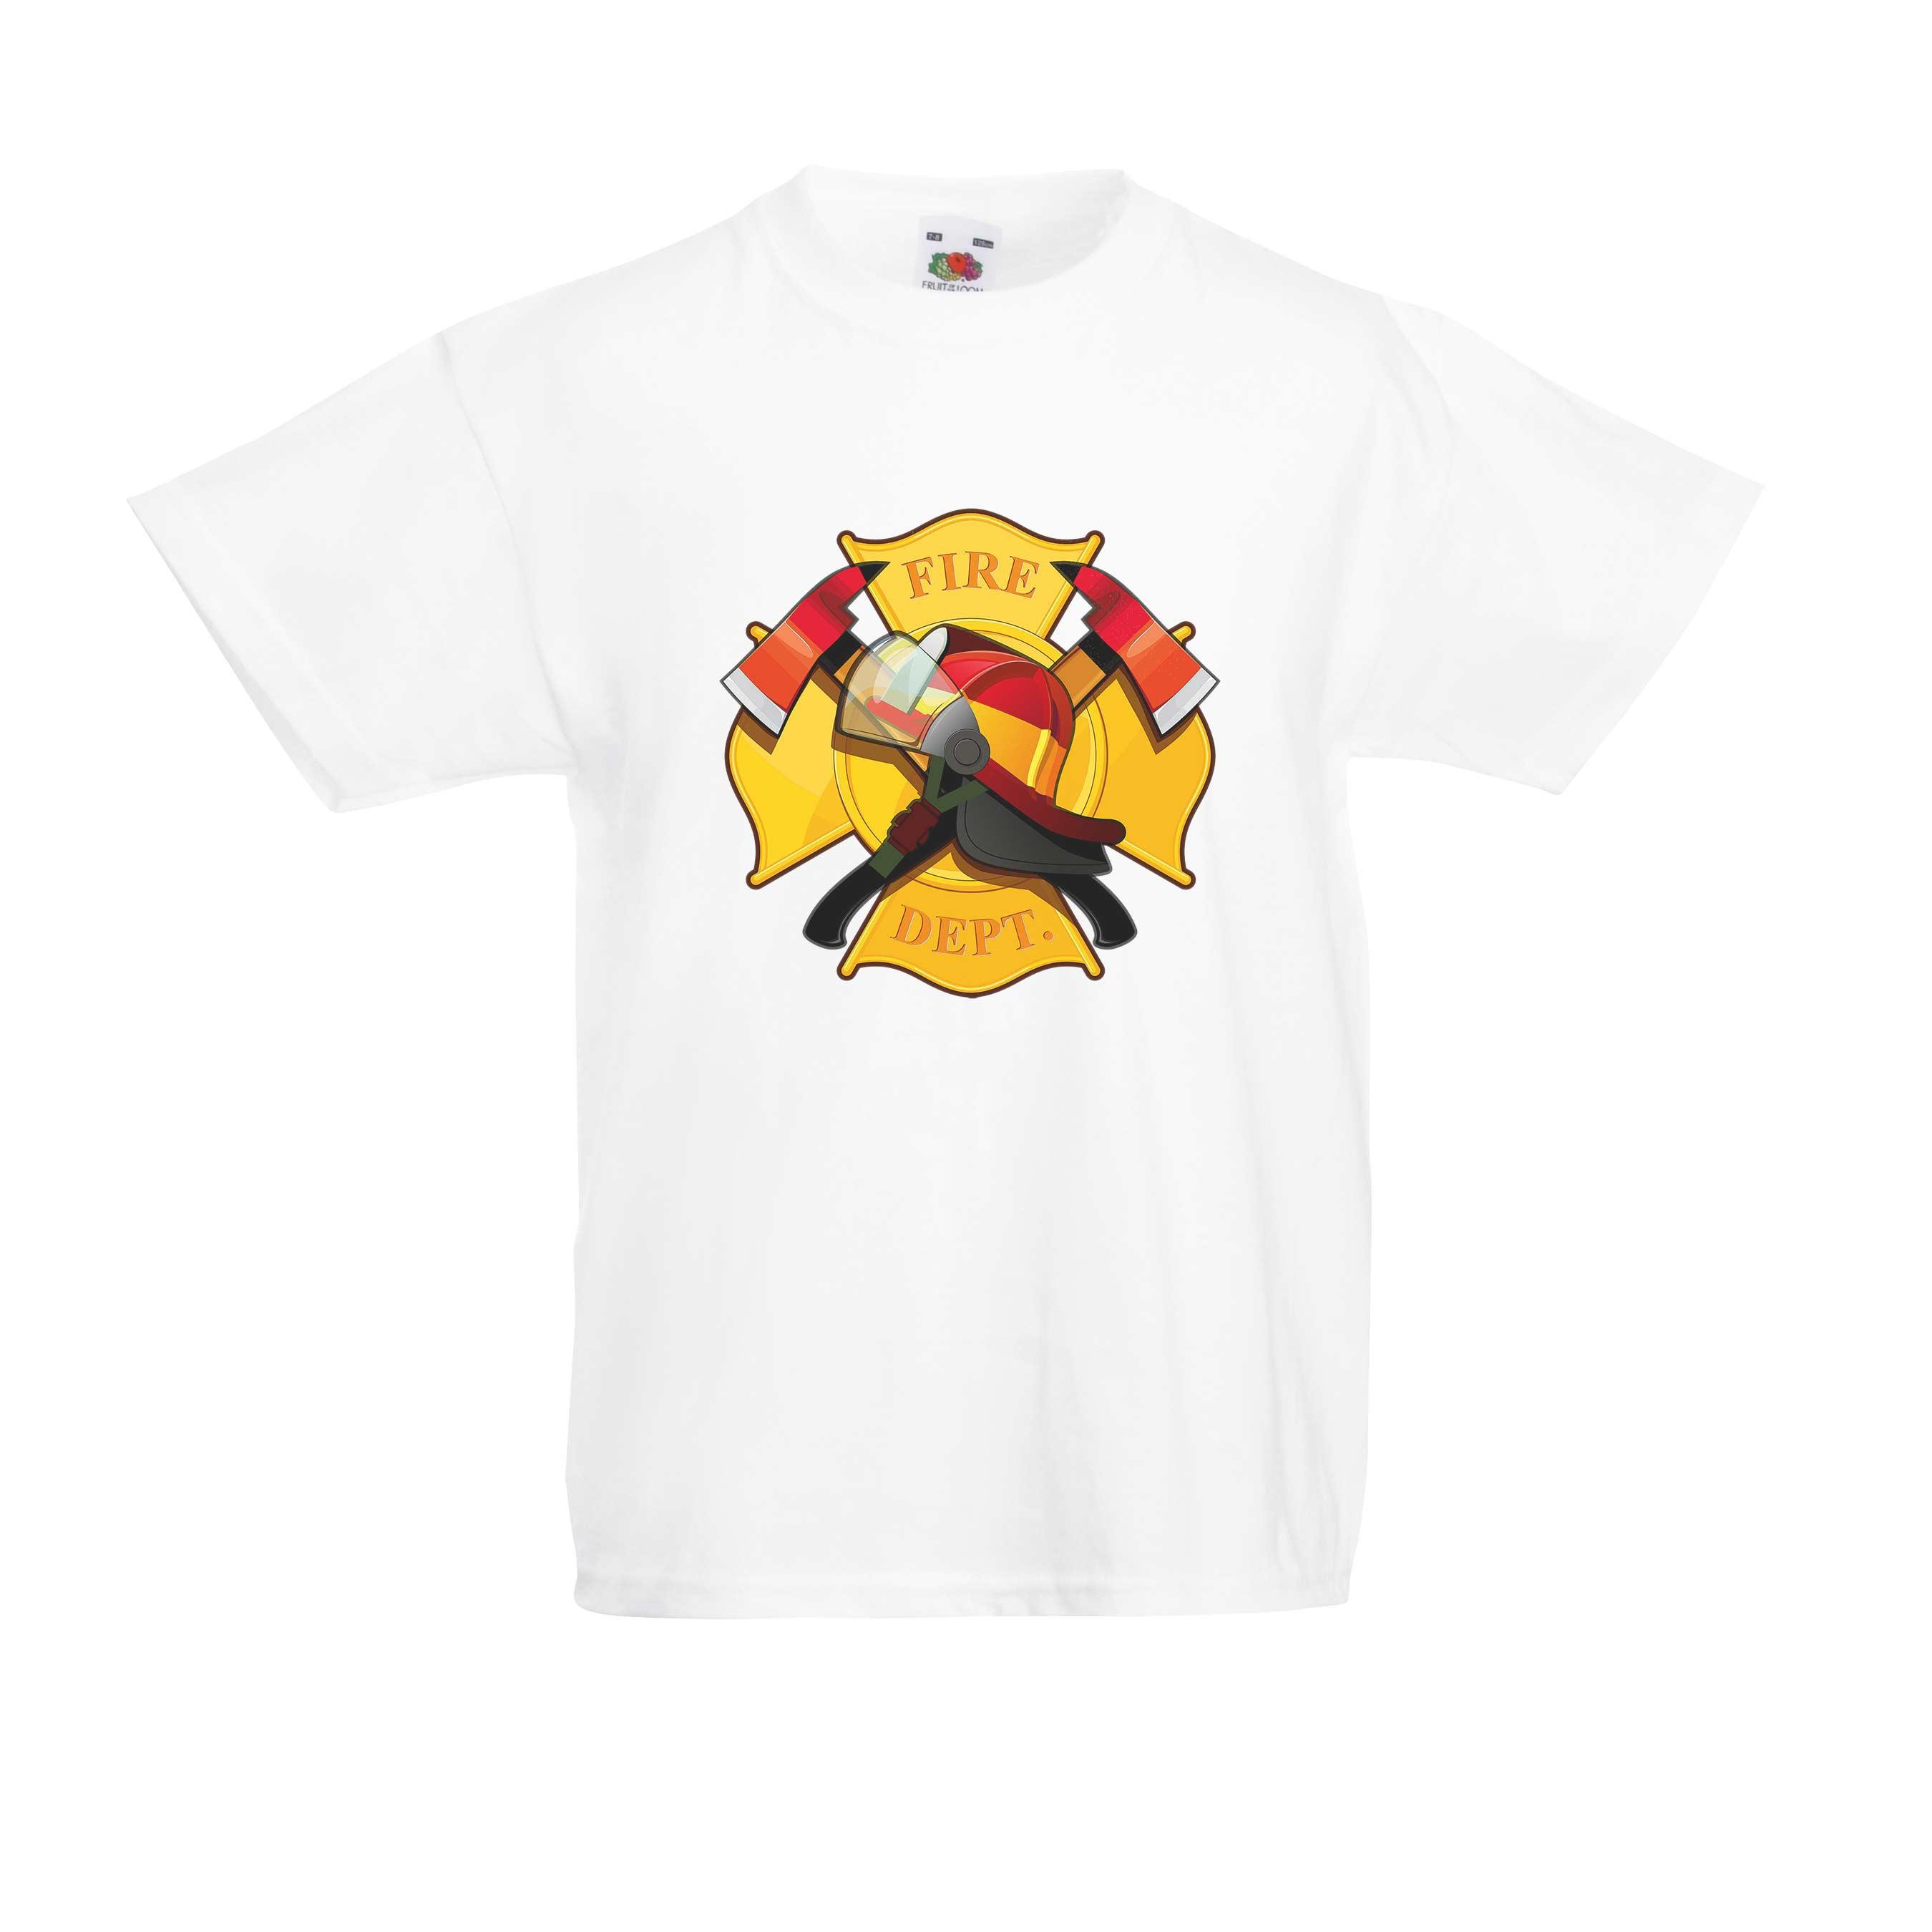 Fire Department design for t-shirt, hoodie & sweatshirt